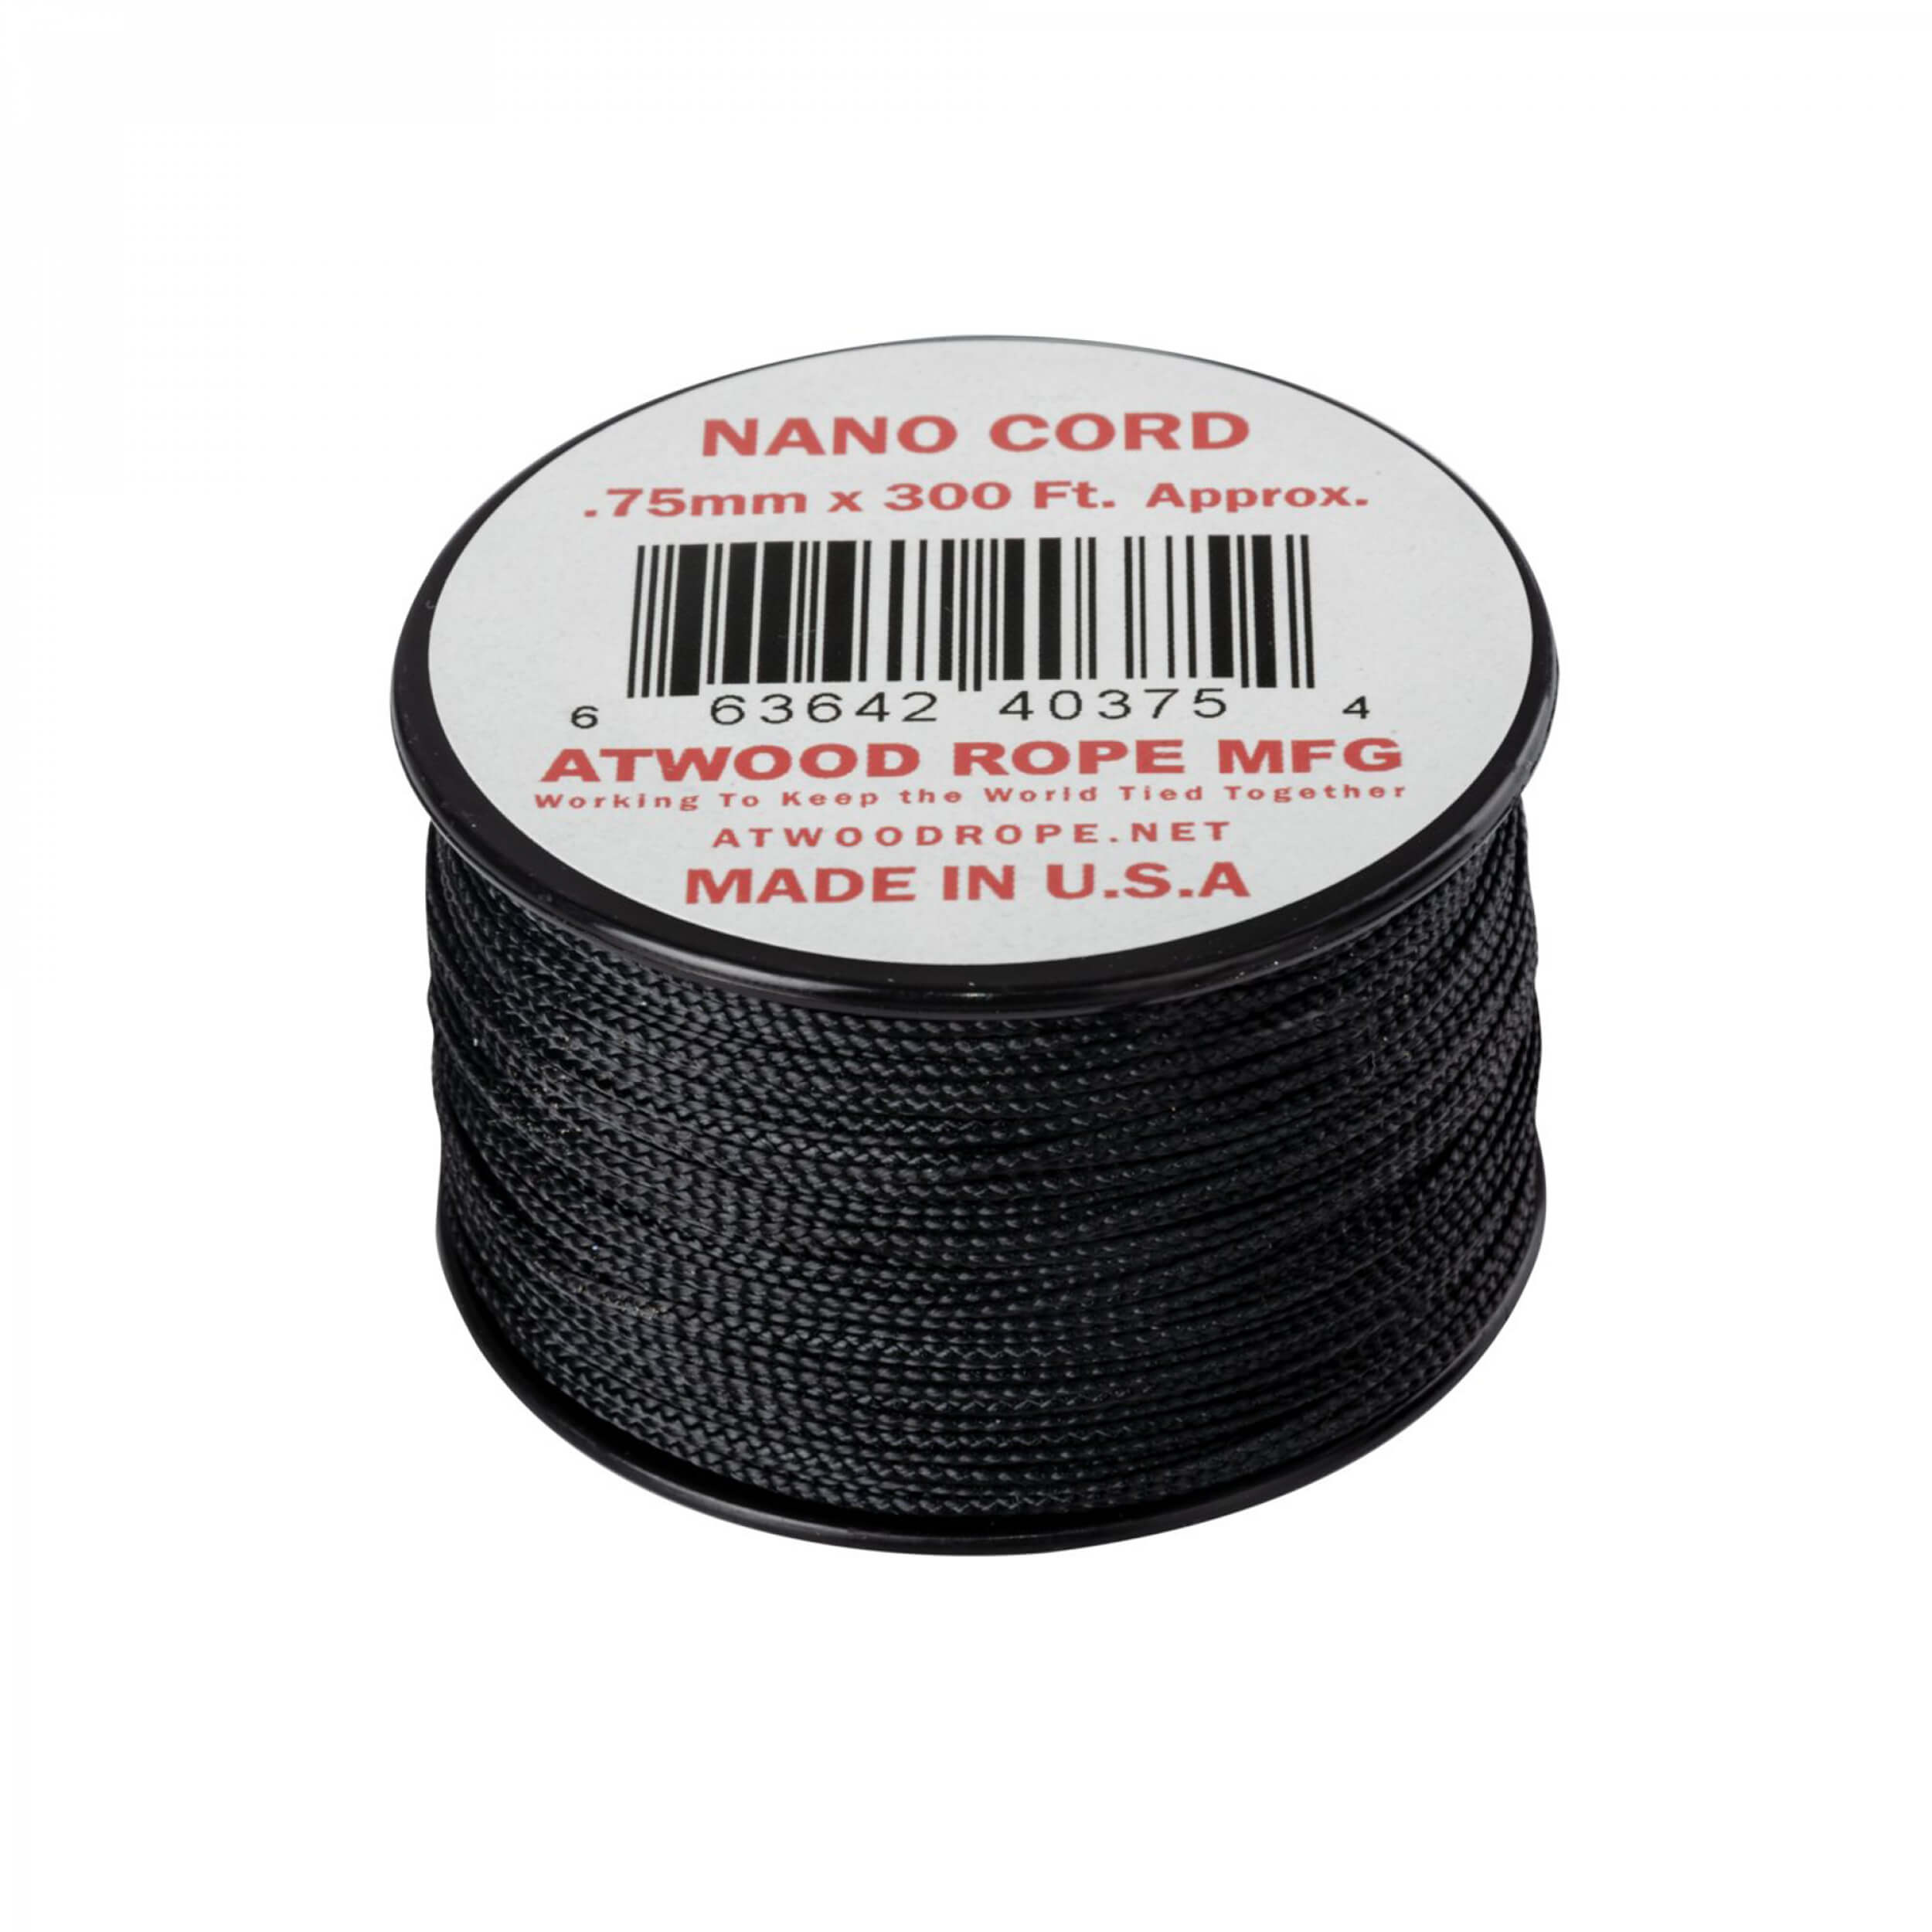 Helikon-Tex Nano Cord (300FT) black